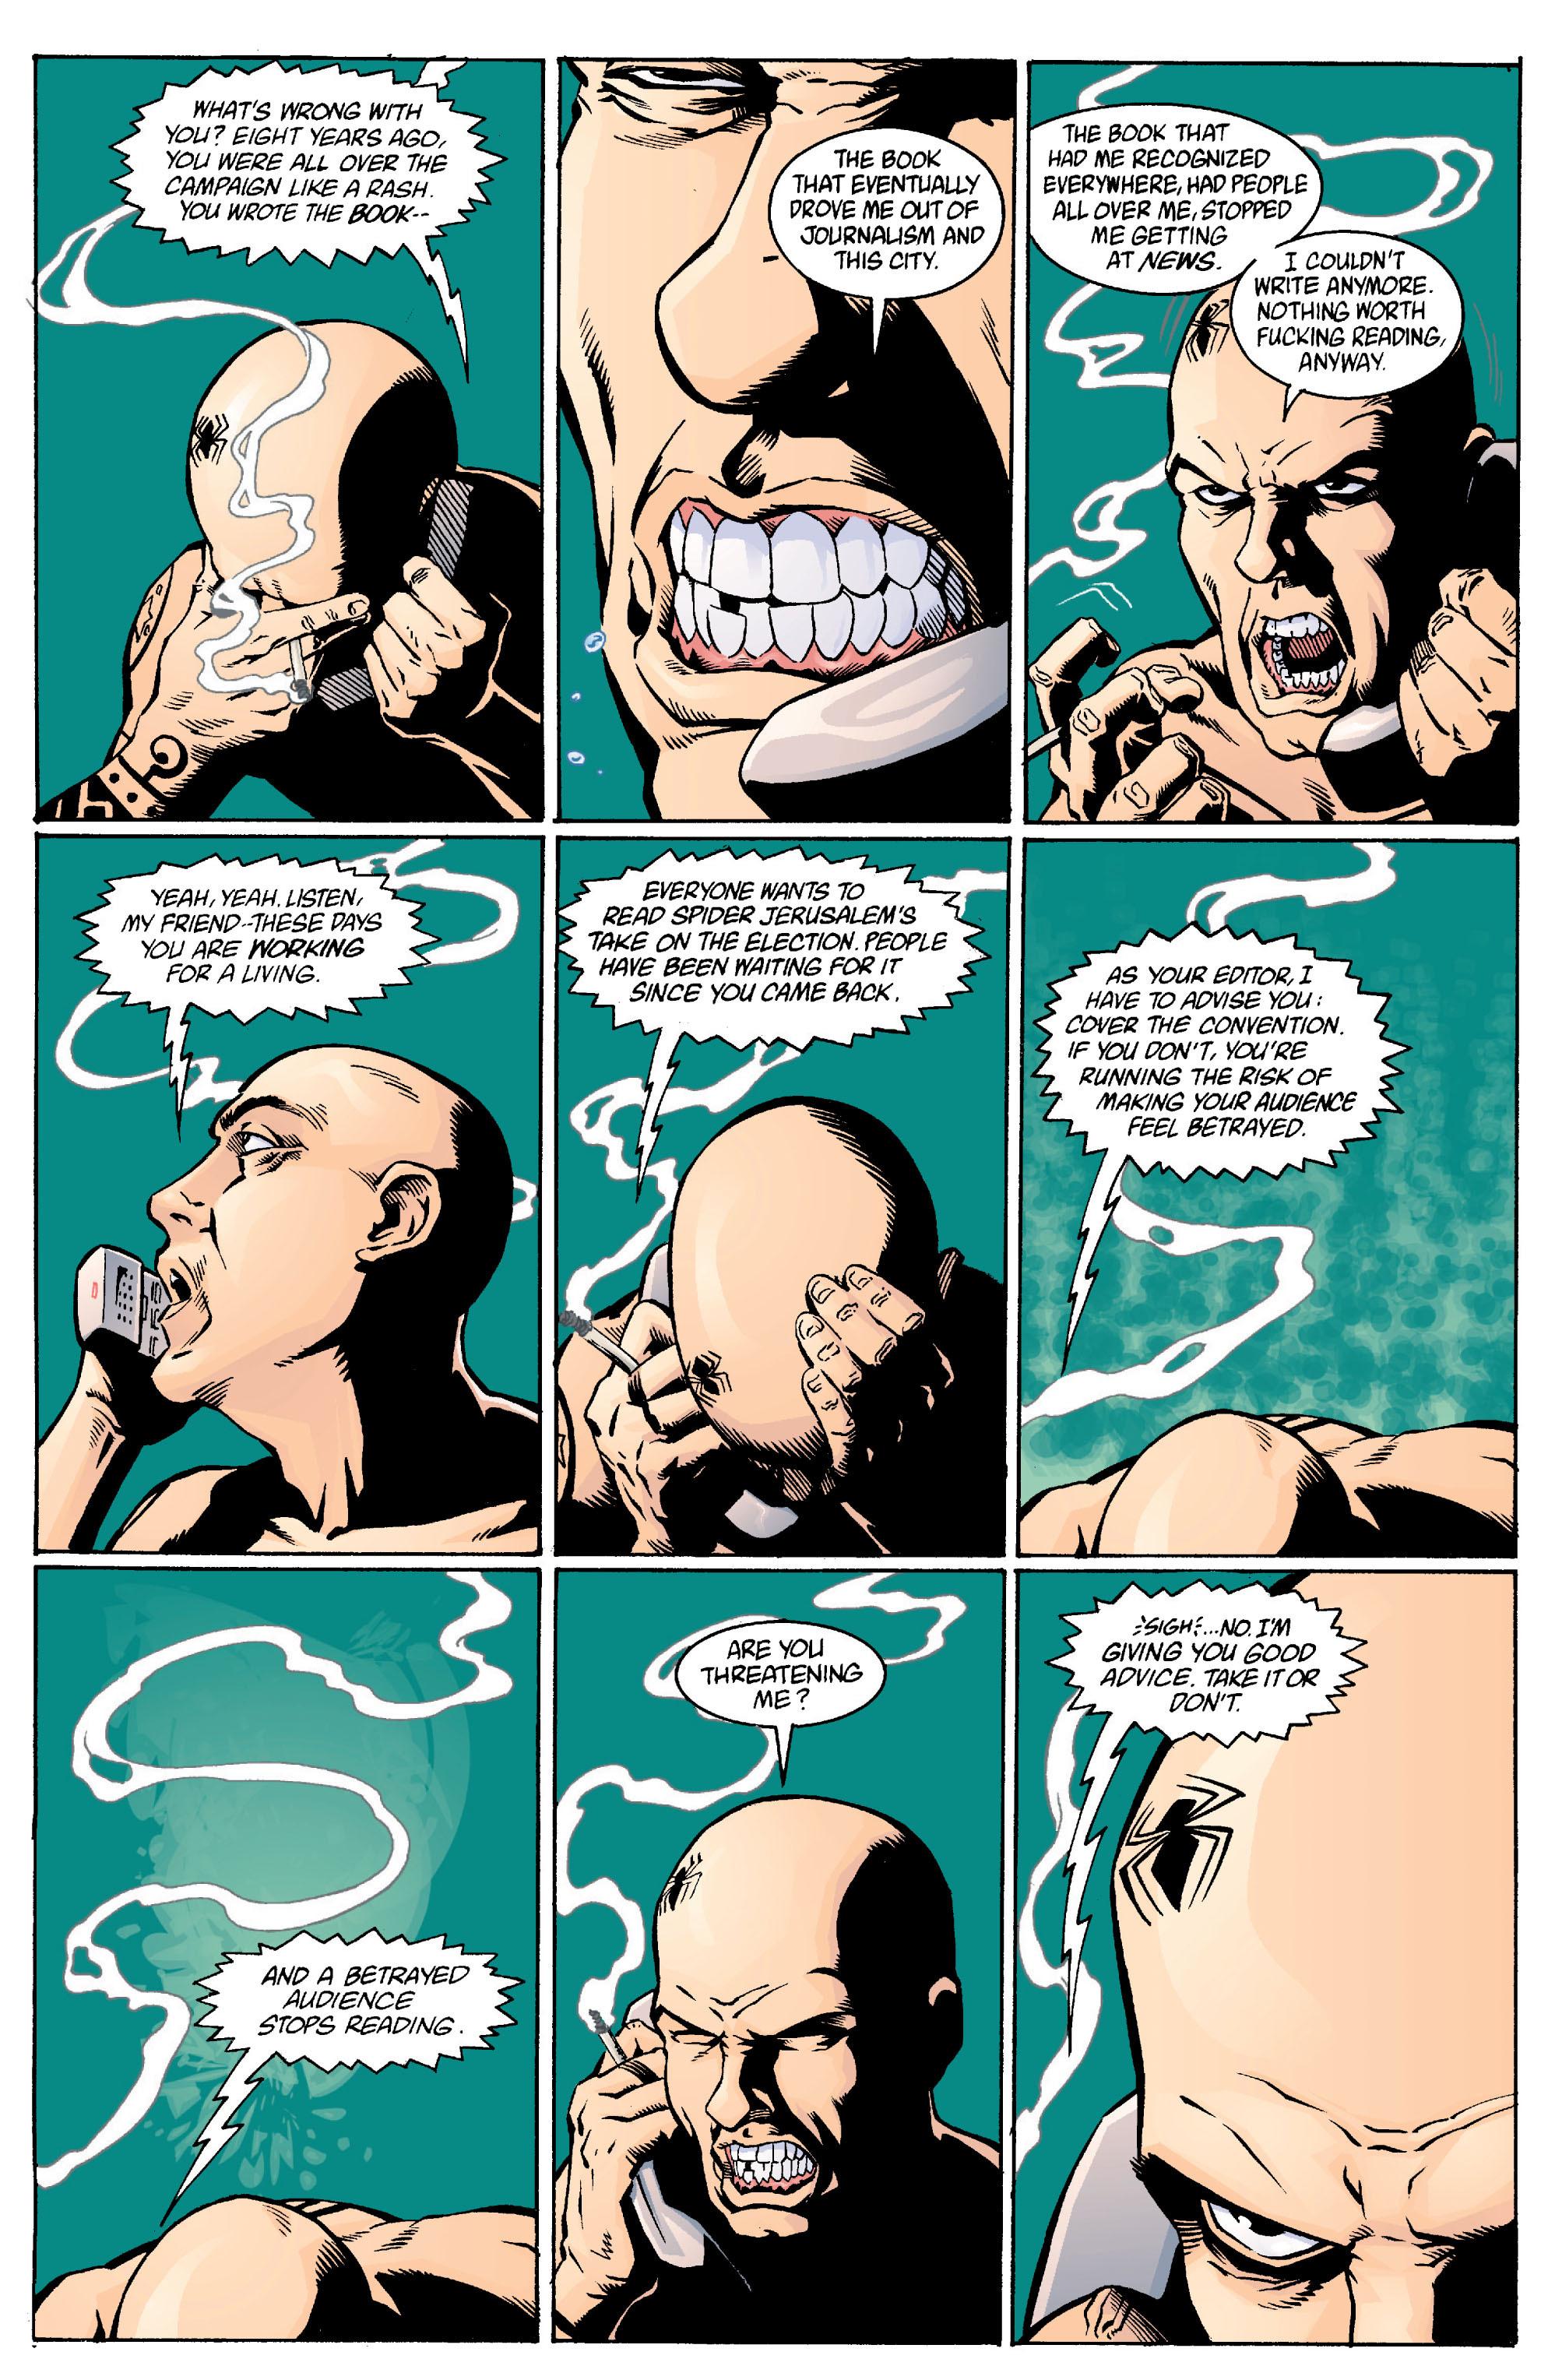 Read online Transmetropolitan comic -  Issue #13 - 13